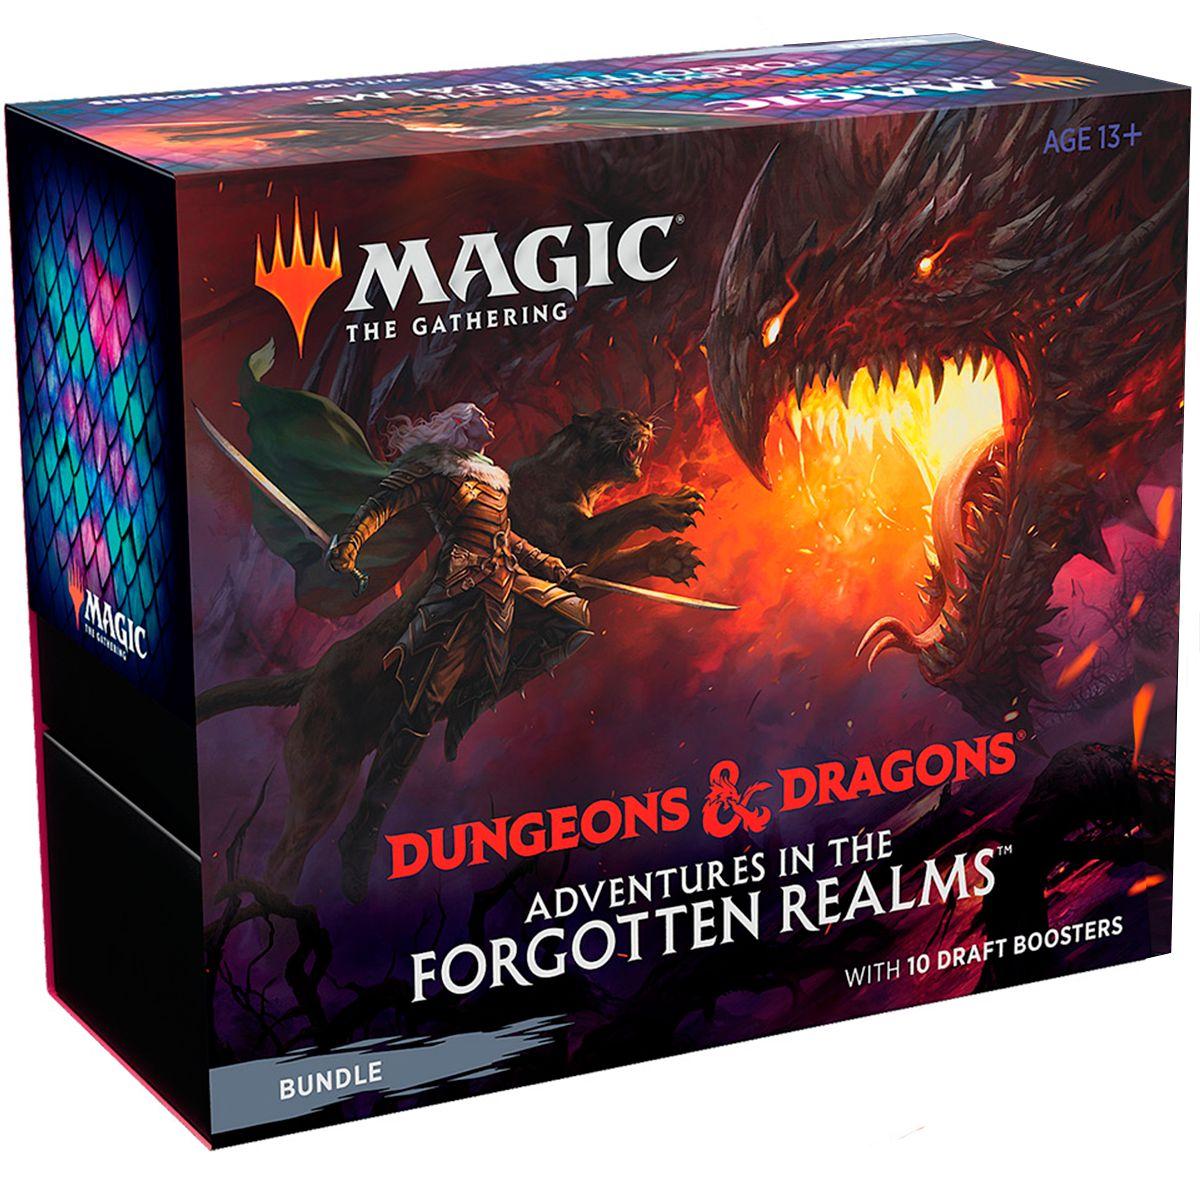 Magic Bundle Adventures In The Forgotten Realms D&D Inglês